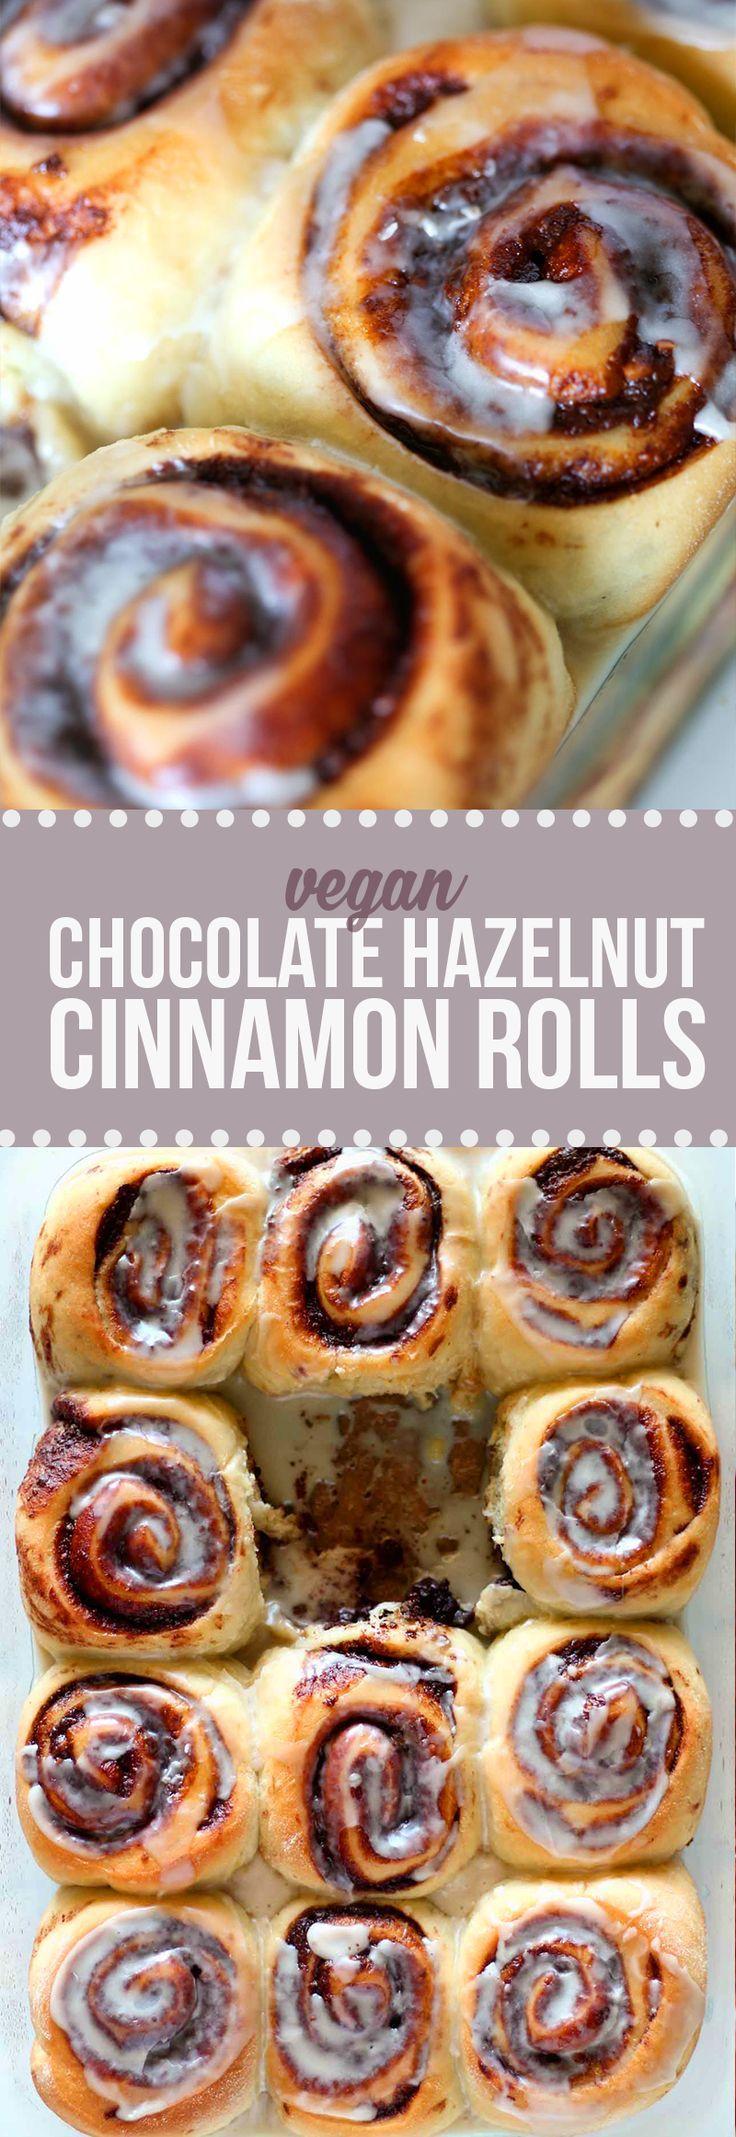 Moist, fluffy, sweet, drool-worthy VEGAN chocolate hazelnut cinnamon rolls!